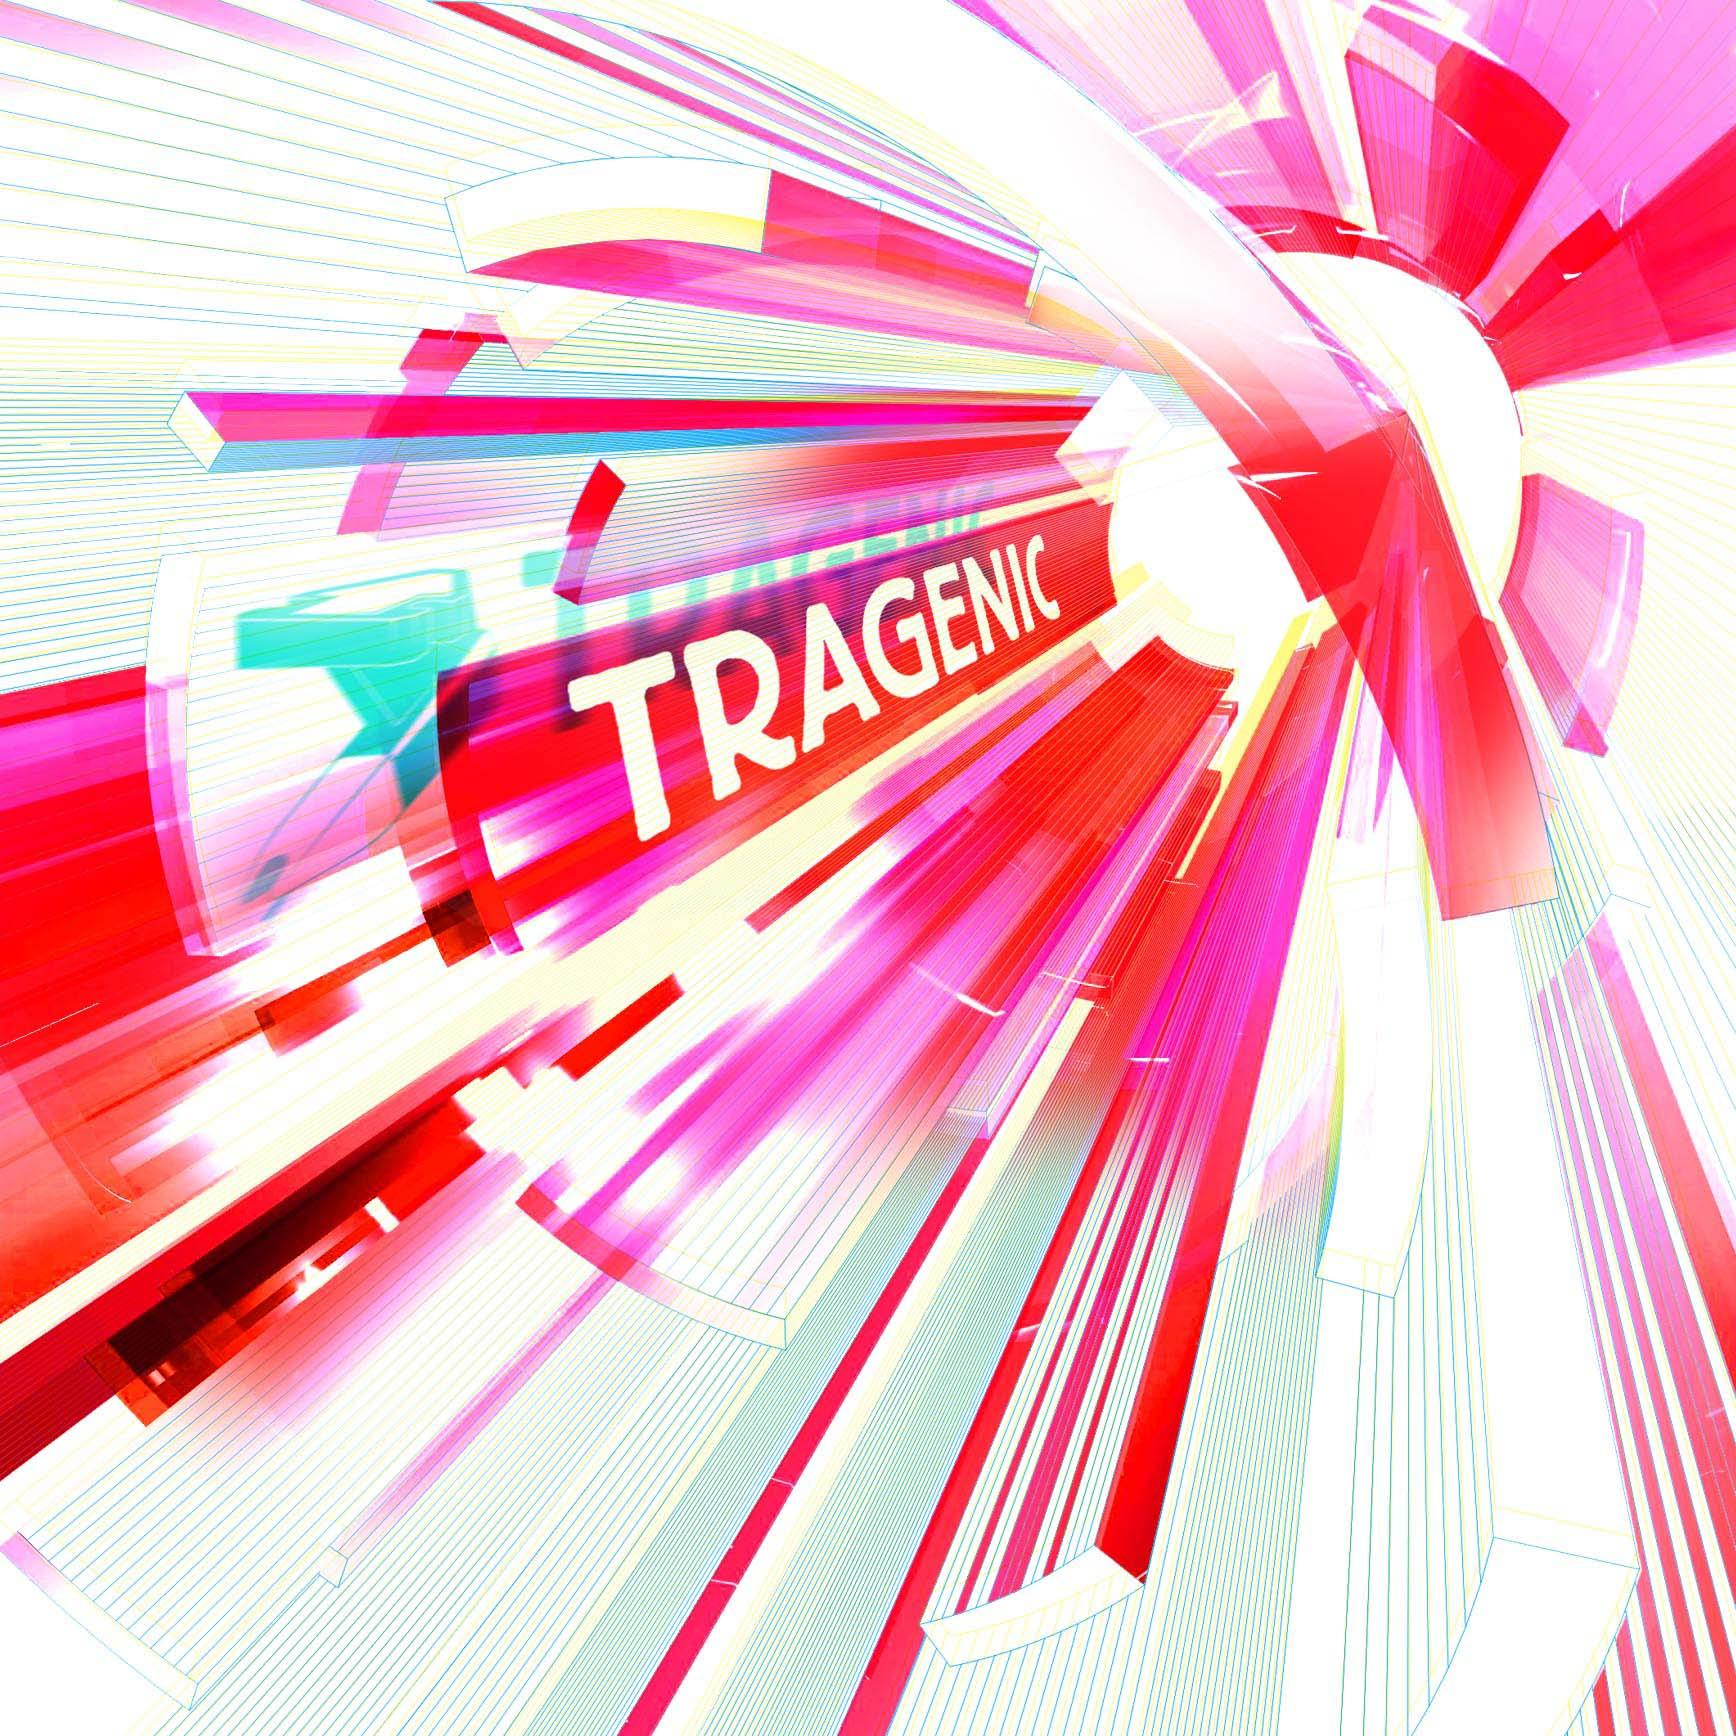 DJ Yoshinori - Tragenic Best - Next Level